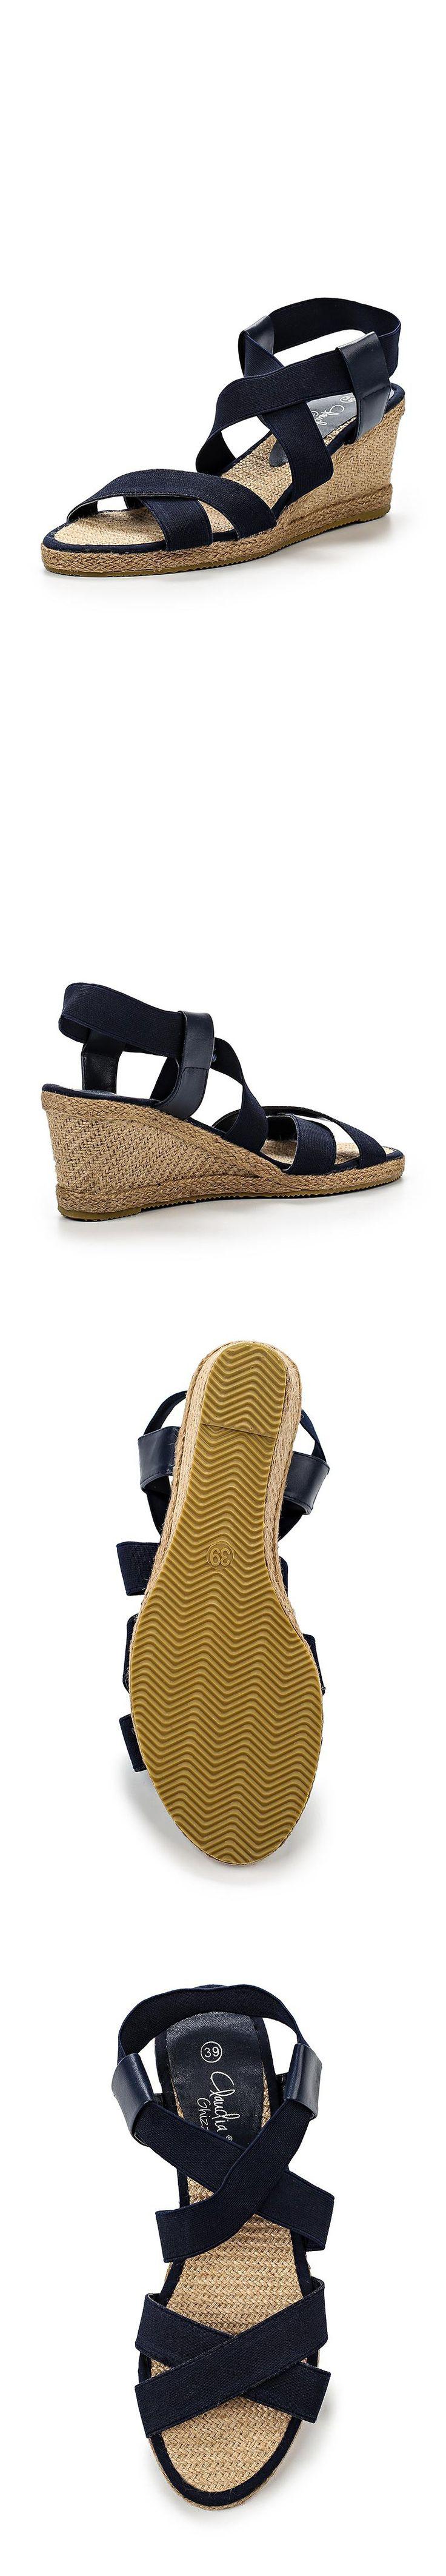 Женская обувь босоножки CLAUDIA GHIZZANI за 2510.00 руб.